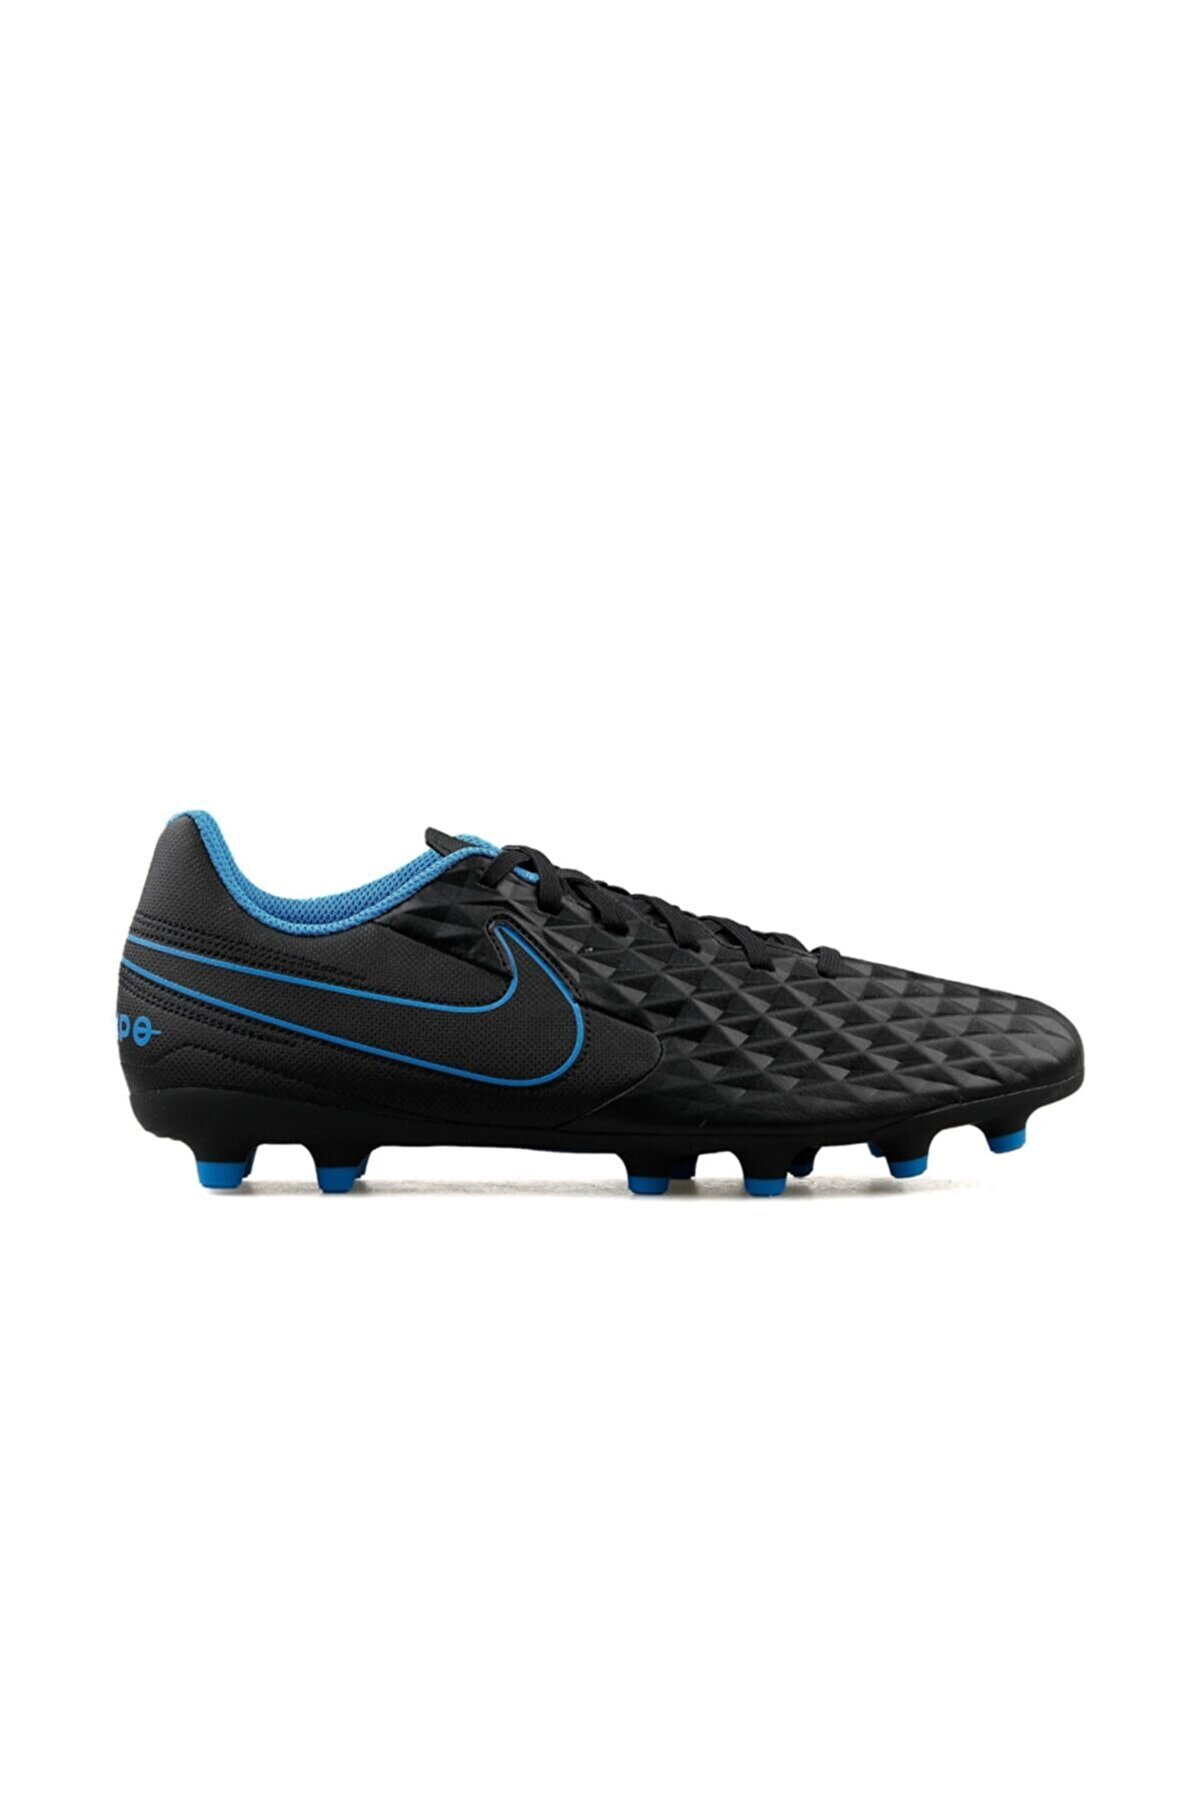 Nike At6107-090 Legend 8 Club Fg/mg Futbol Krampon Ayakkabı